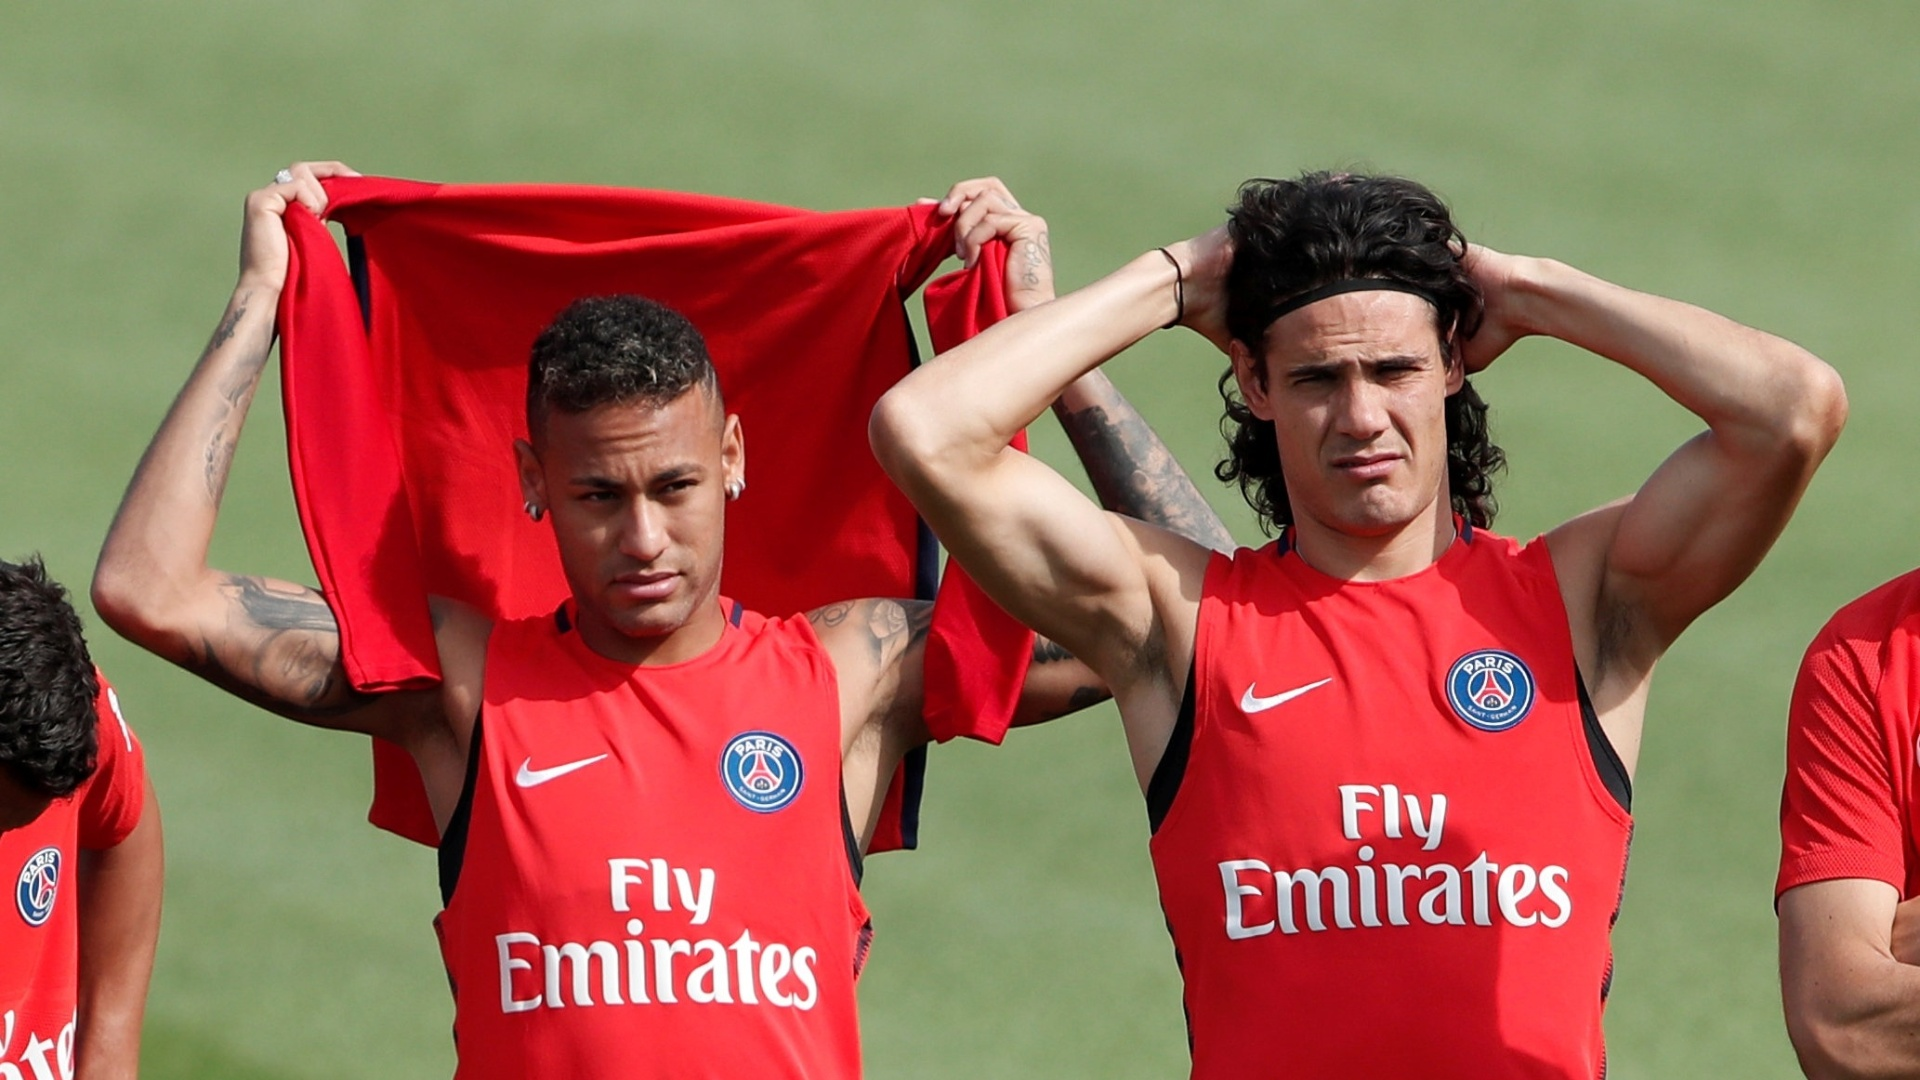 Neymar e Cavani participam de treino do Paris Saint-Germain